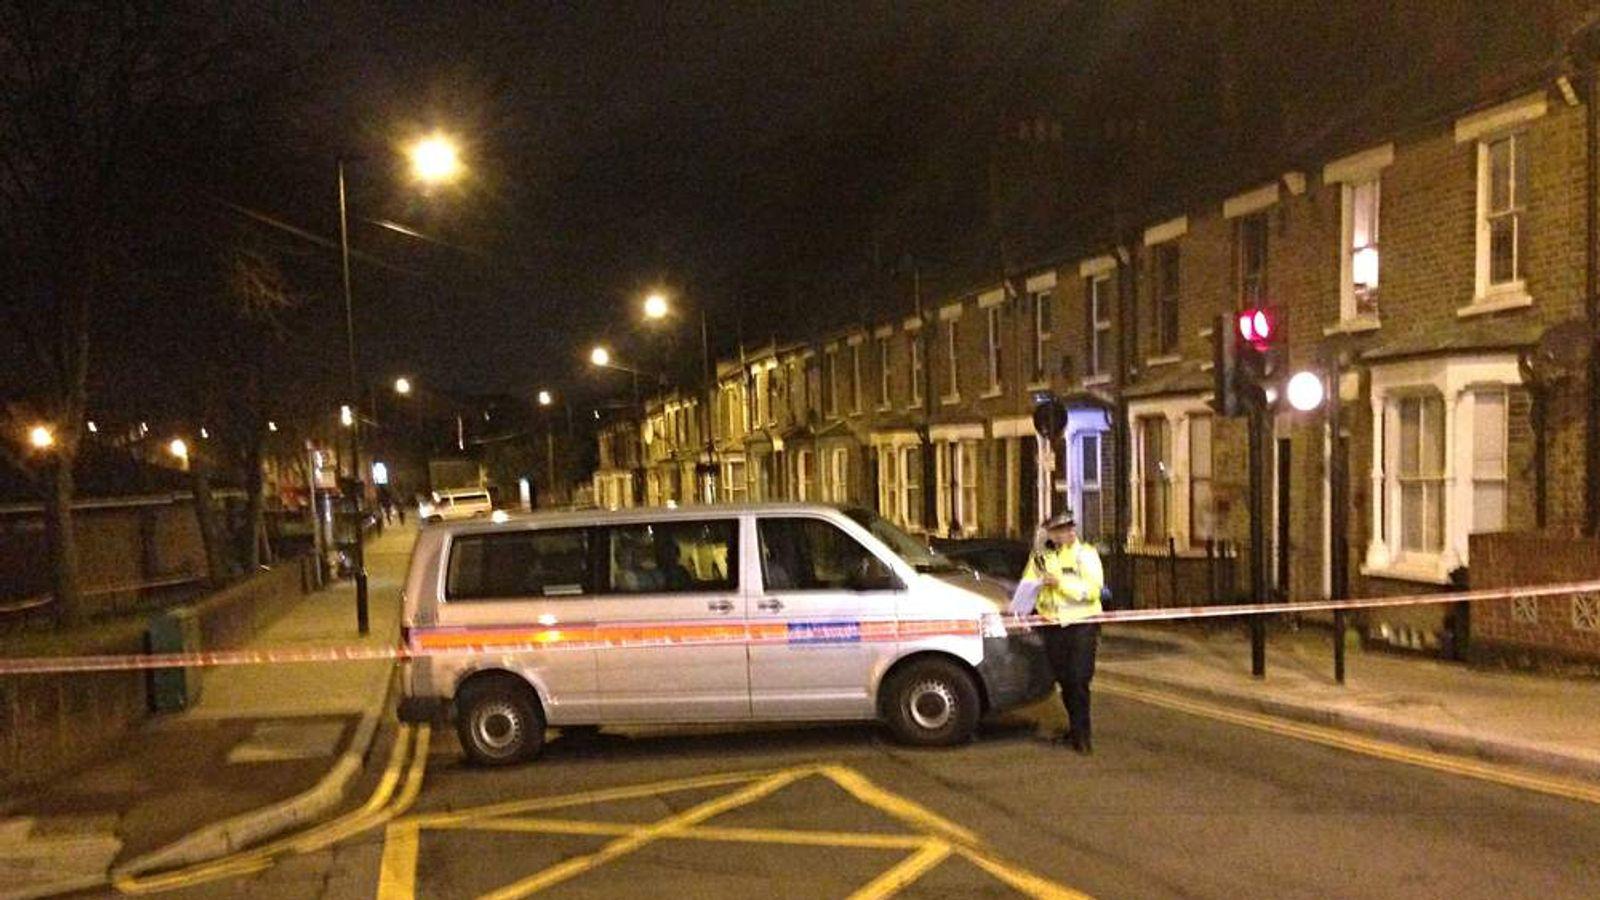 The teenager was shot in Hackney